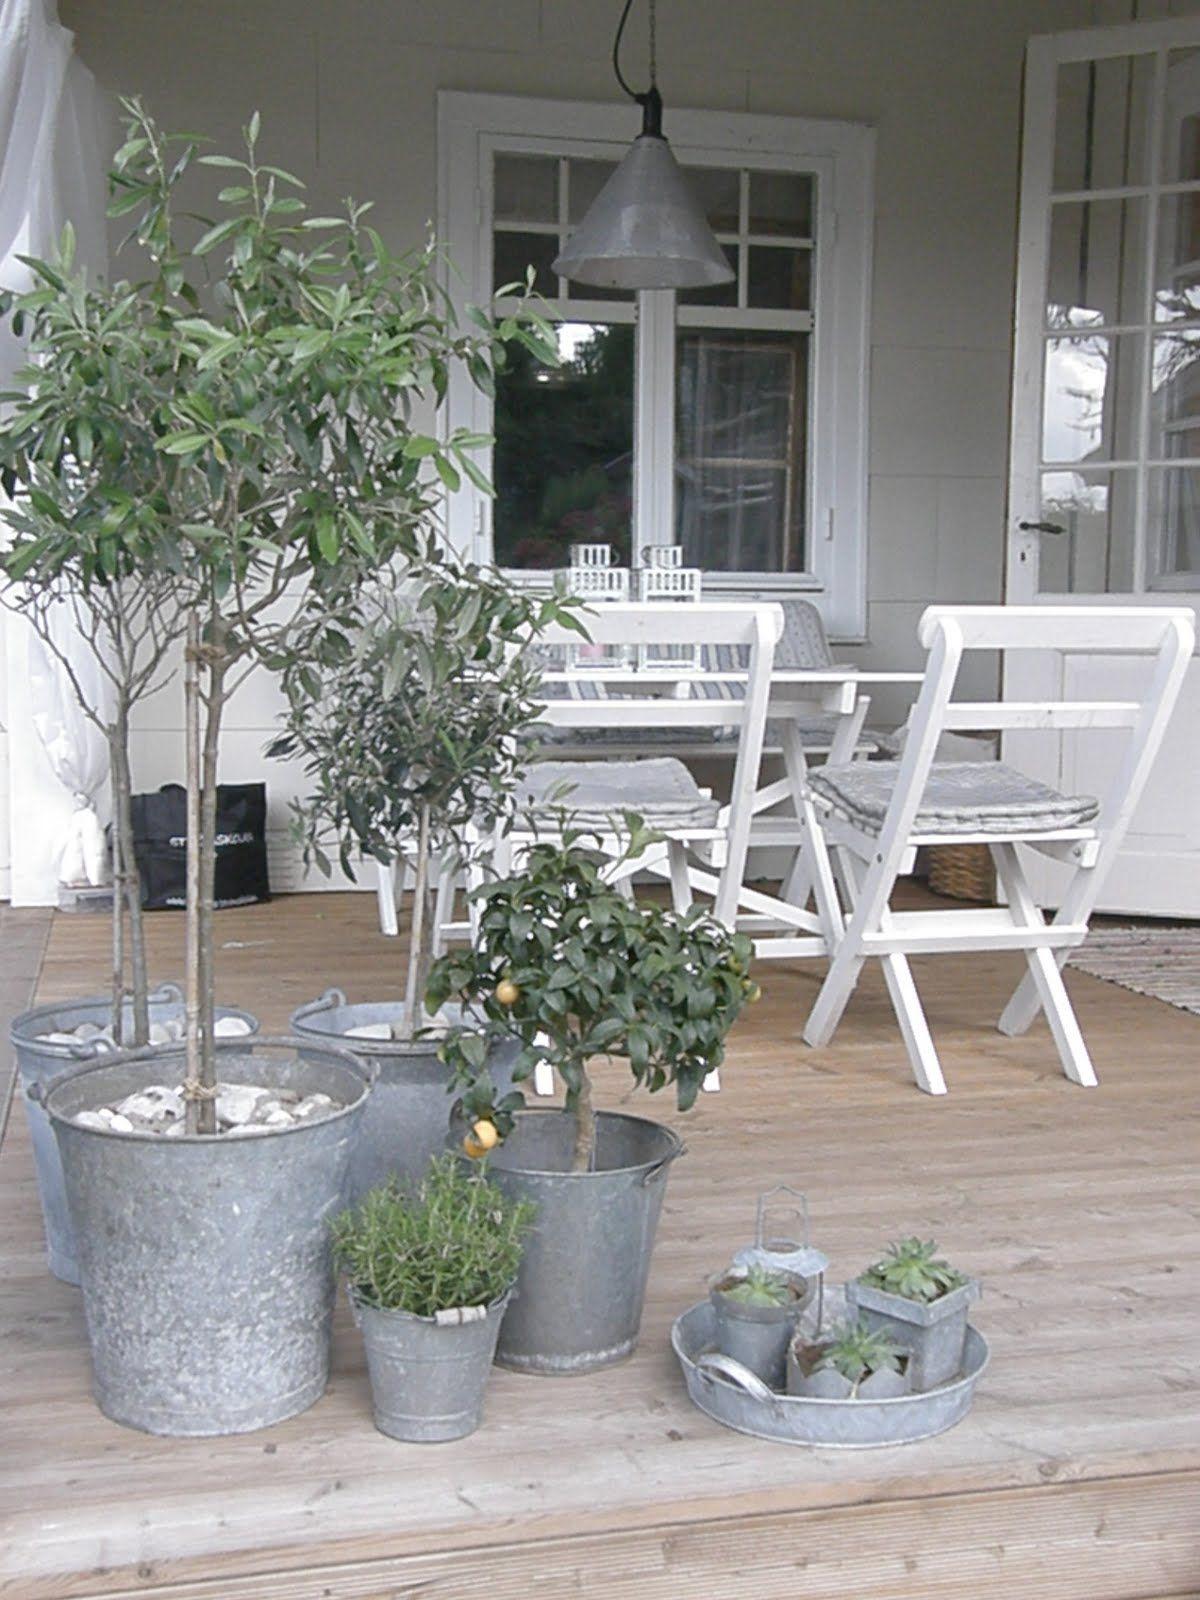 Livet p fyran le jardin pinterest garten ideen for Deko topfpflanzen